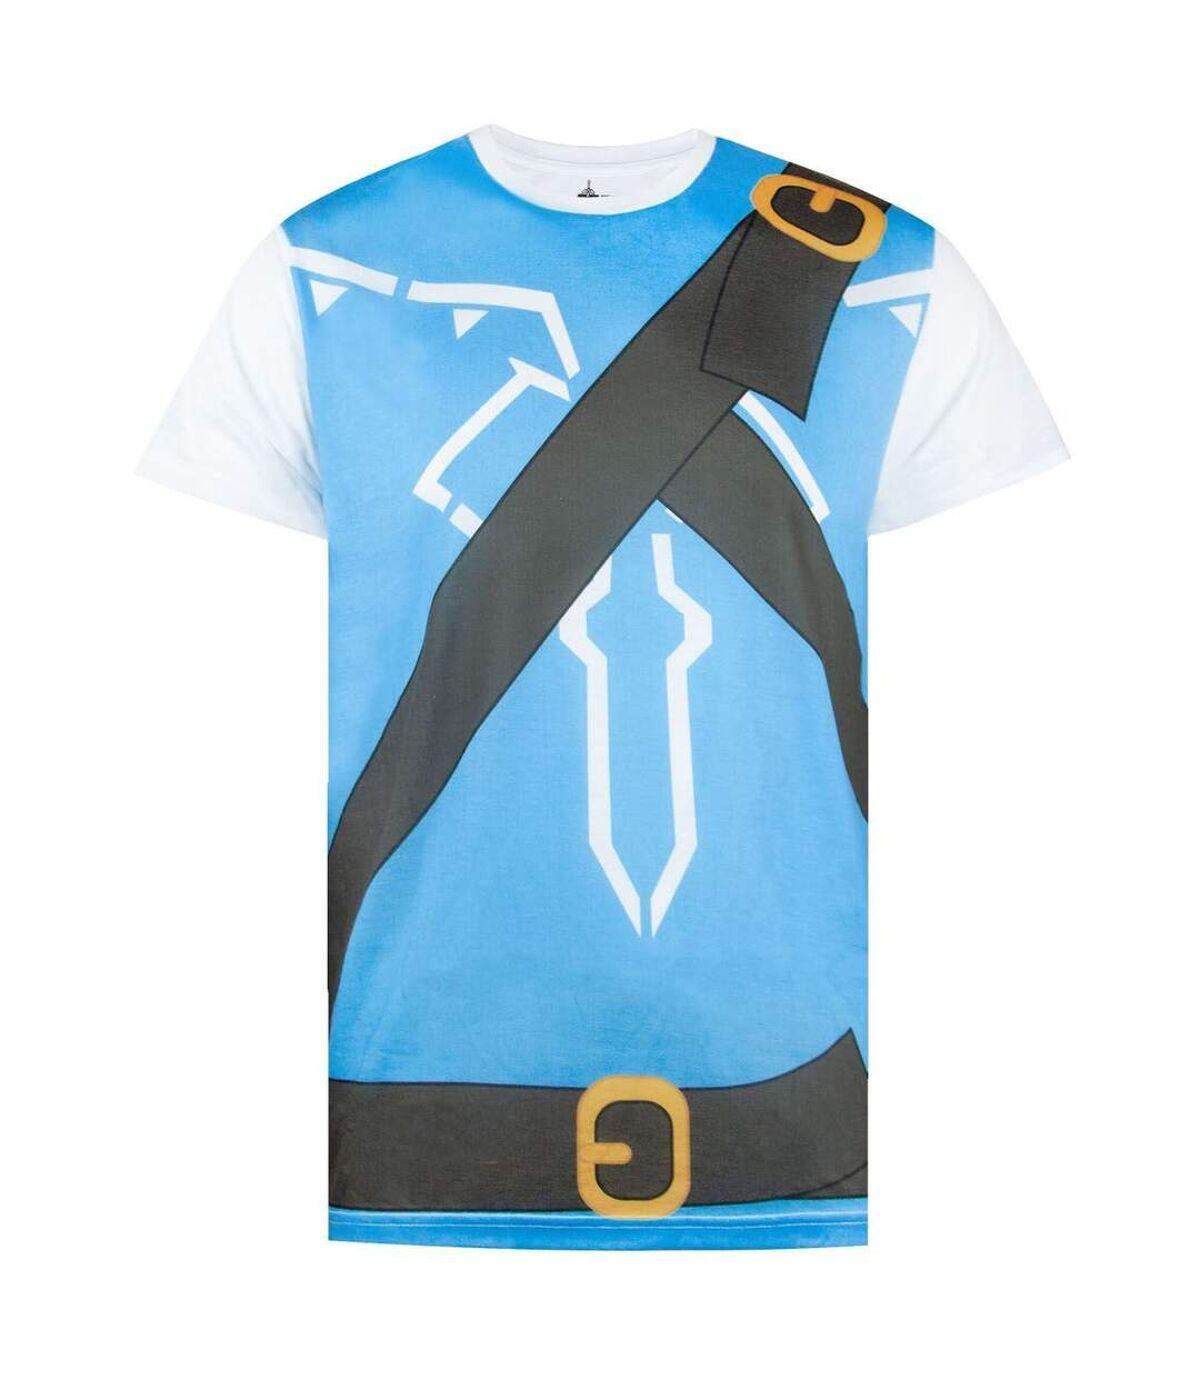 The Legend of Zelda Mens Breath Of The Wild Costume Cosplay T-Shirt (White/Blue) - UTNS5257